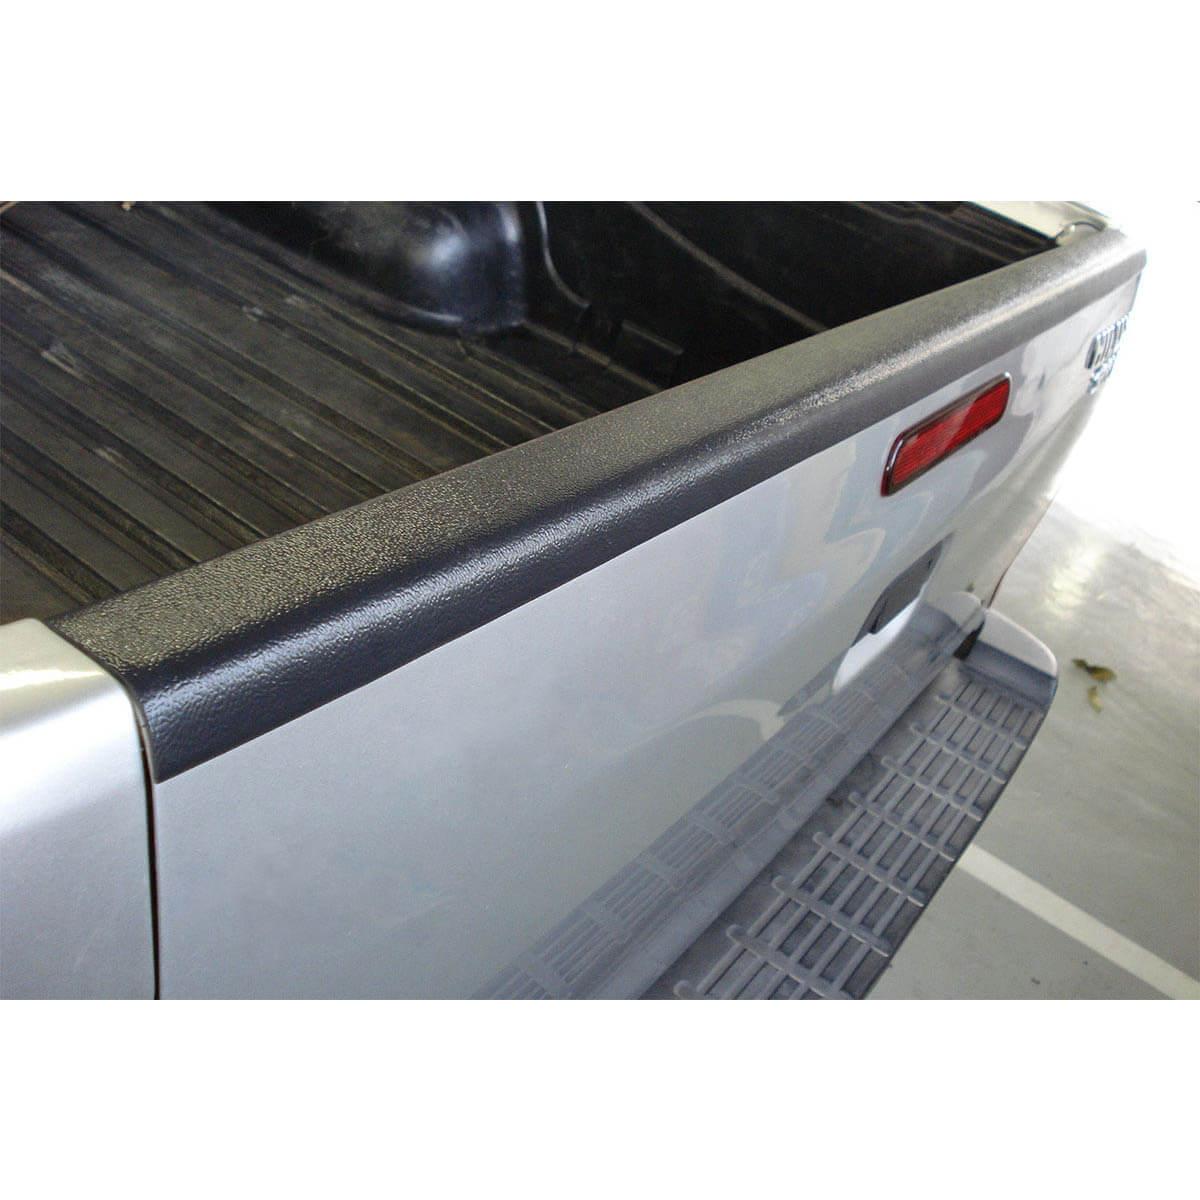 Protetor borda tampa caçamba Bepo Nova S10 cabine dupla 2012 a 2019